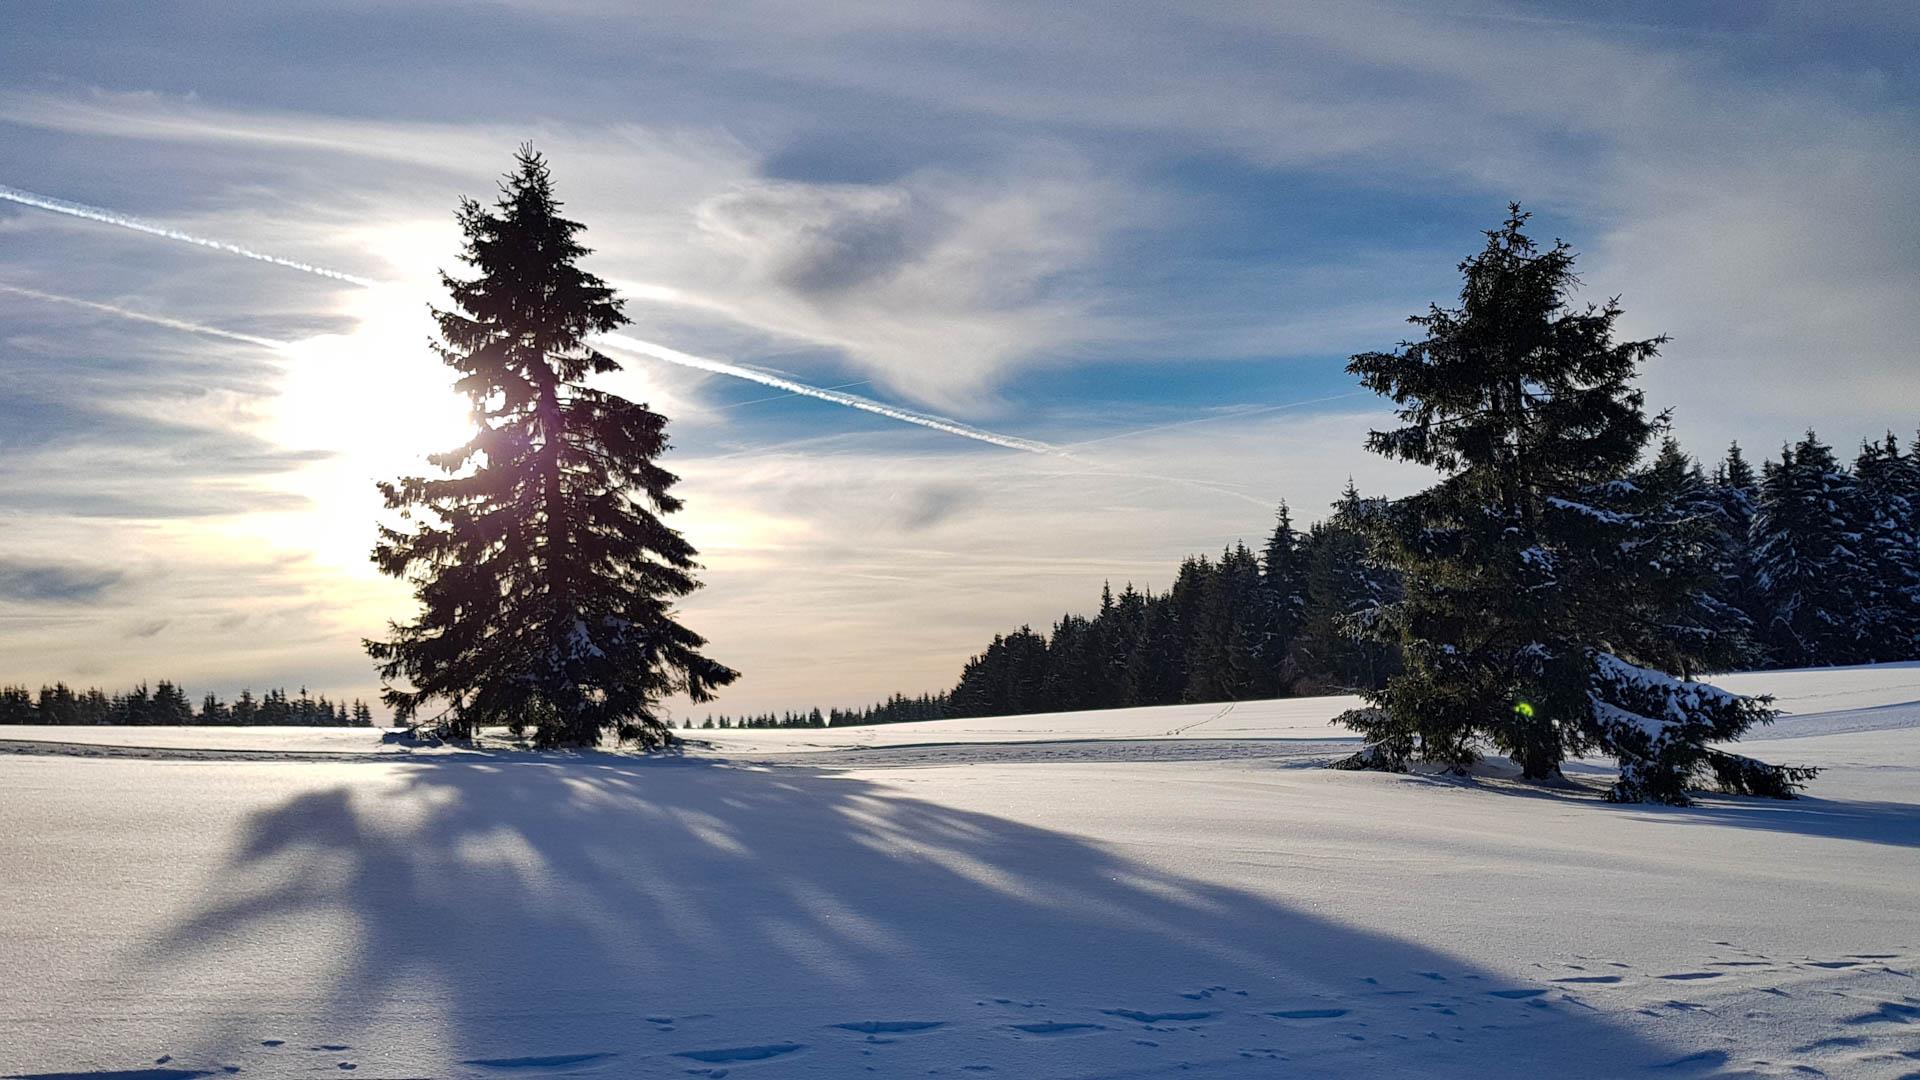 Feuerberg im Winter 2019